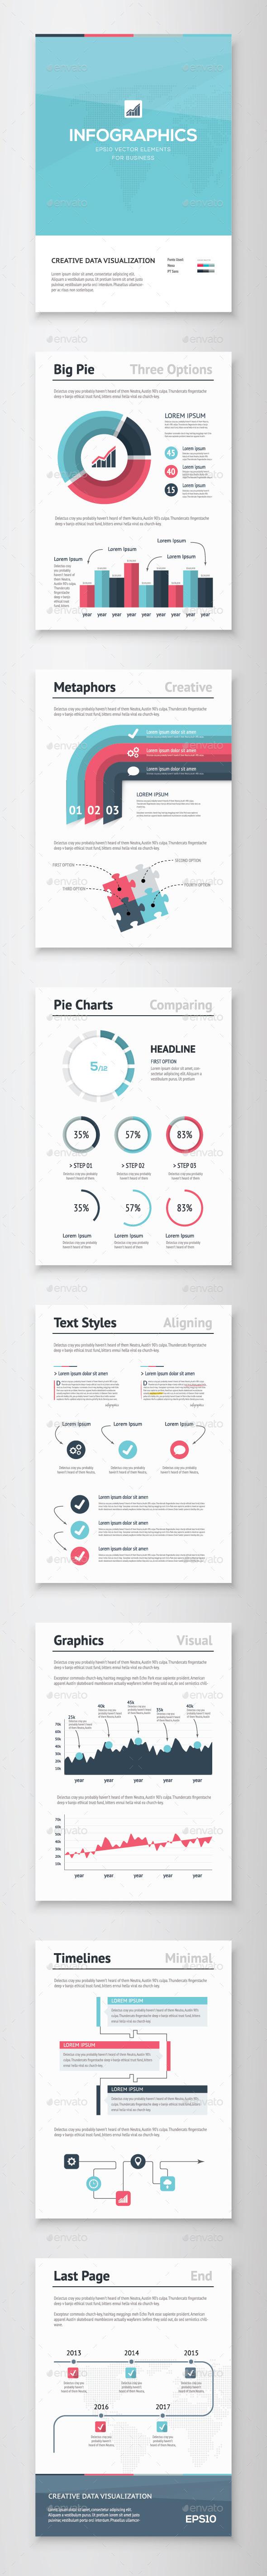 Infographic Brochure Vector Elements Kit 5